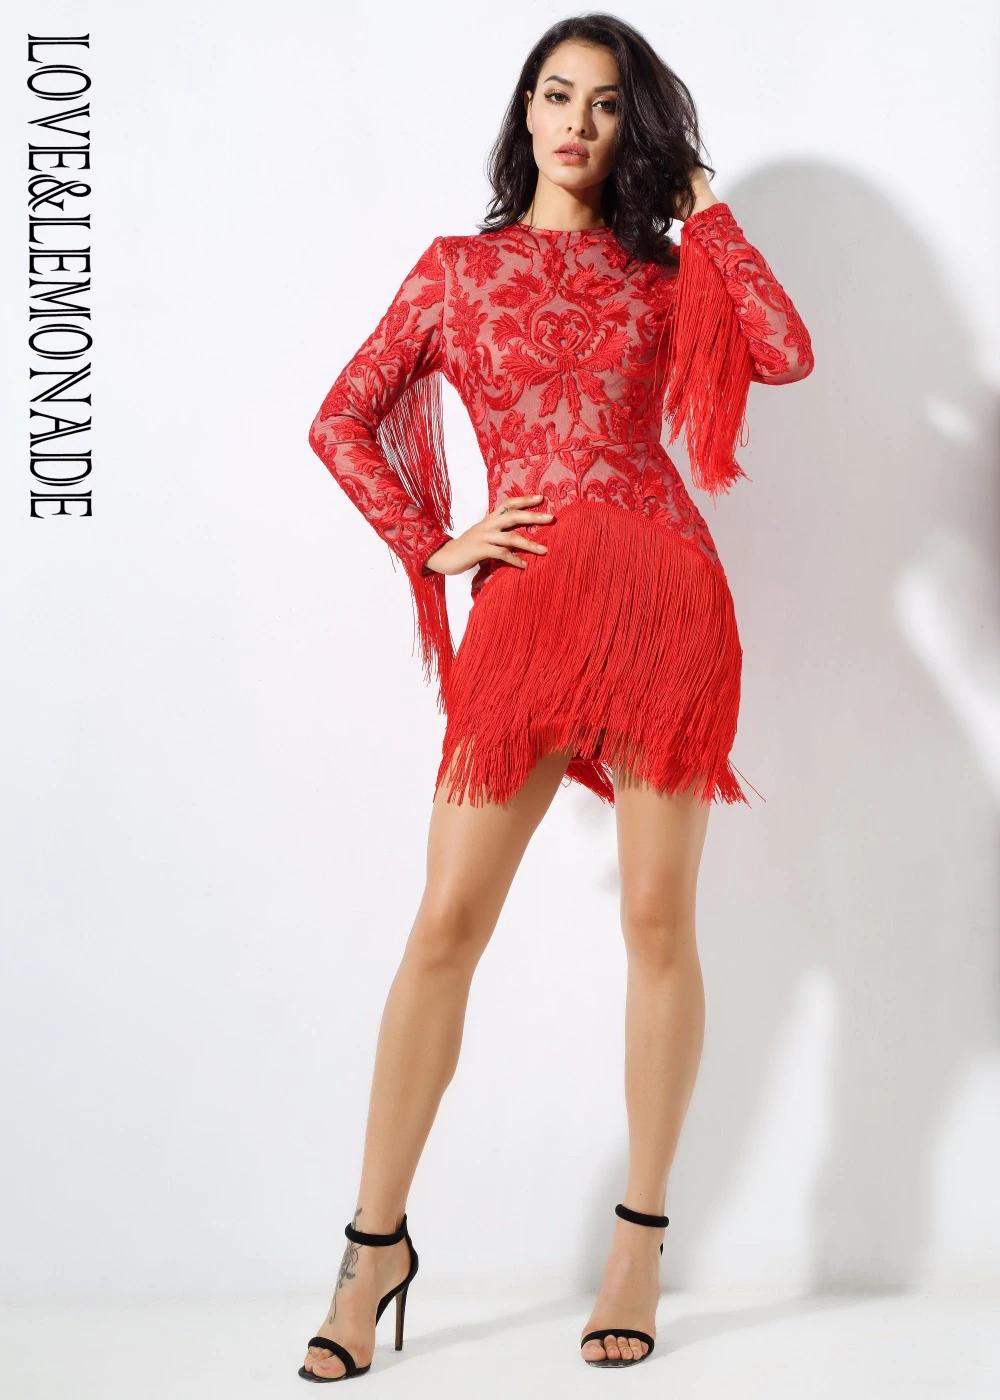 Love Lemonade Flower Rattan Embroidery Tassel Dress Long Sleeves Slim Dress Red Black White Lm0380 Fashion Mini Dress Fringe Dress Dresses [ 1400 x 1000 Pixel ]